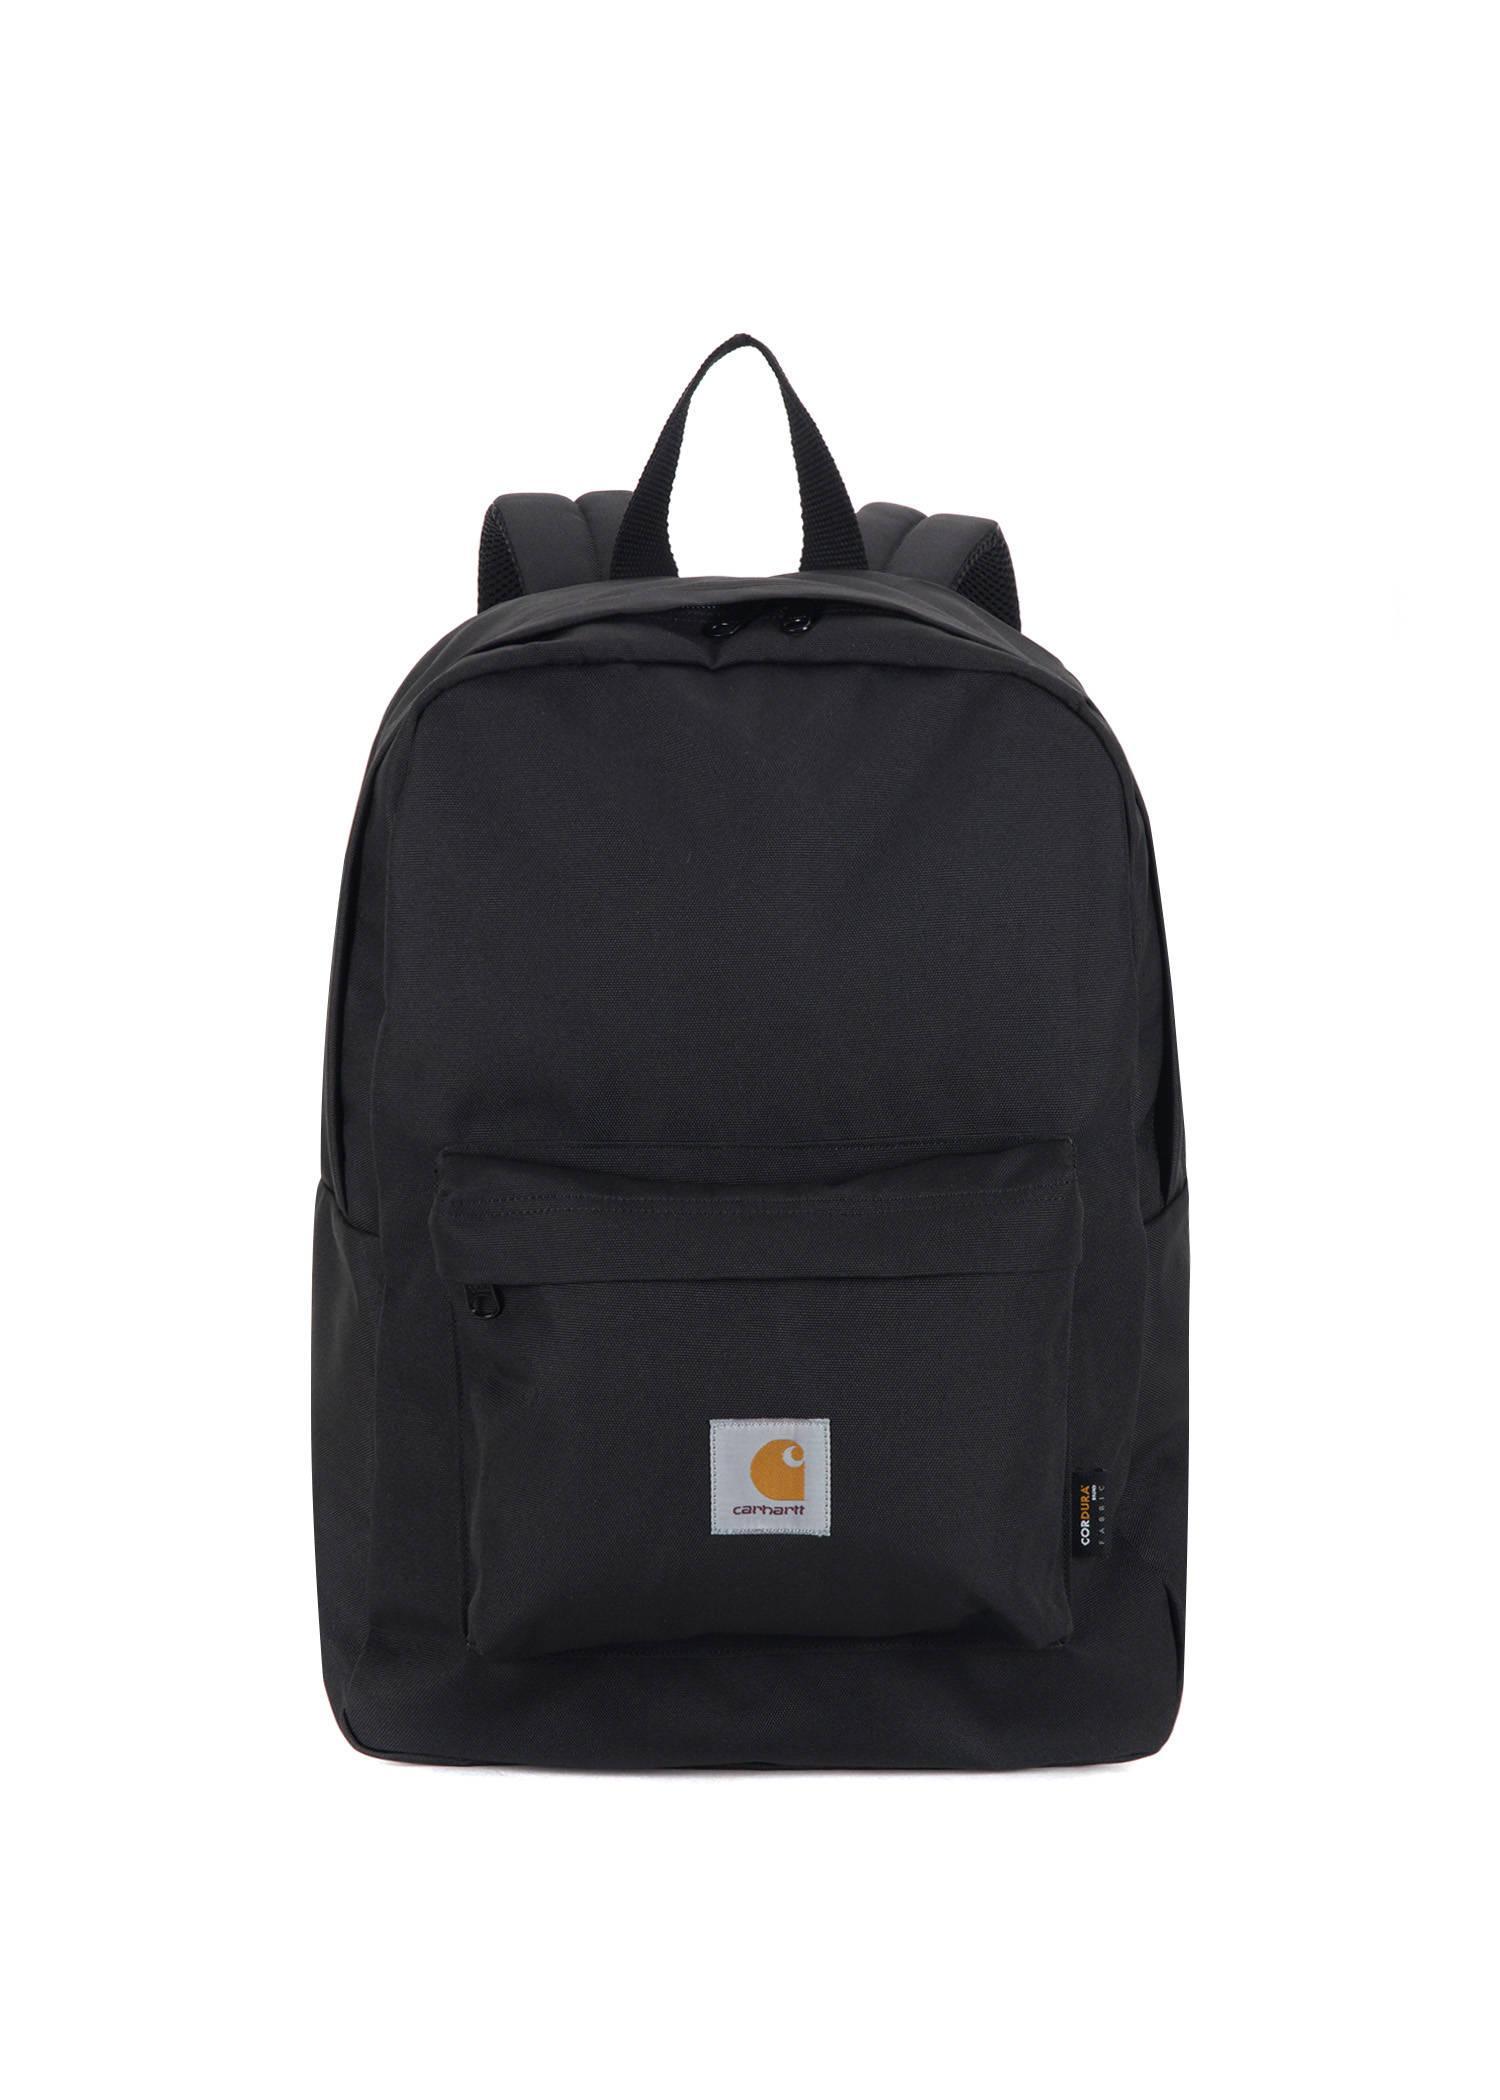 Carhartt Watch Backpack In Soot/Black